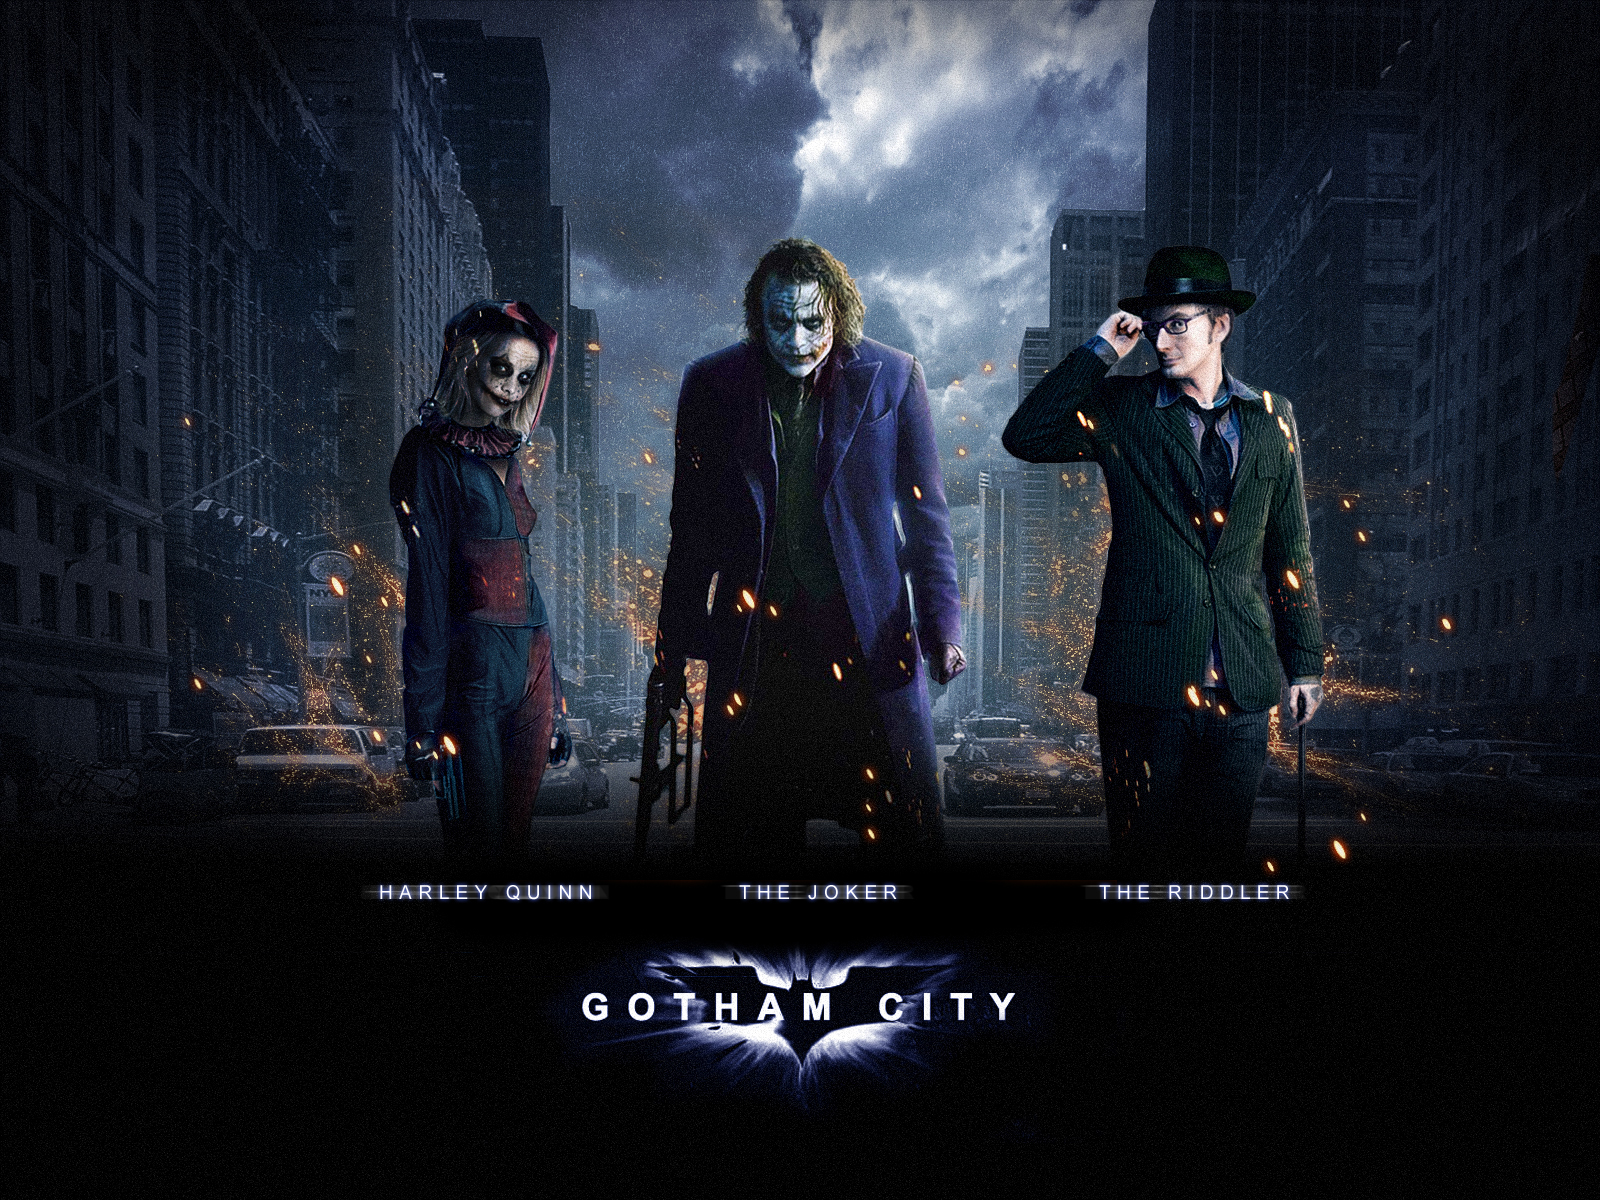 Batman Gotham City Wallpaper by Billoi 1600x1200